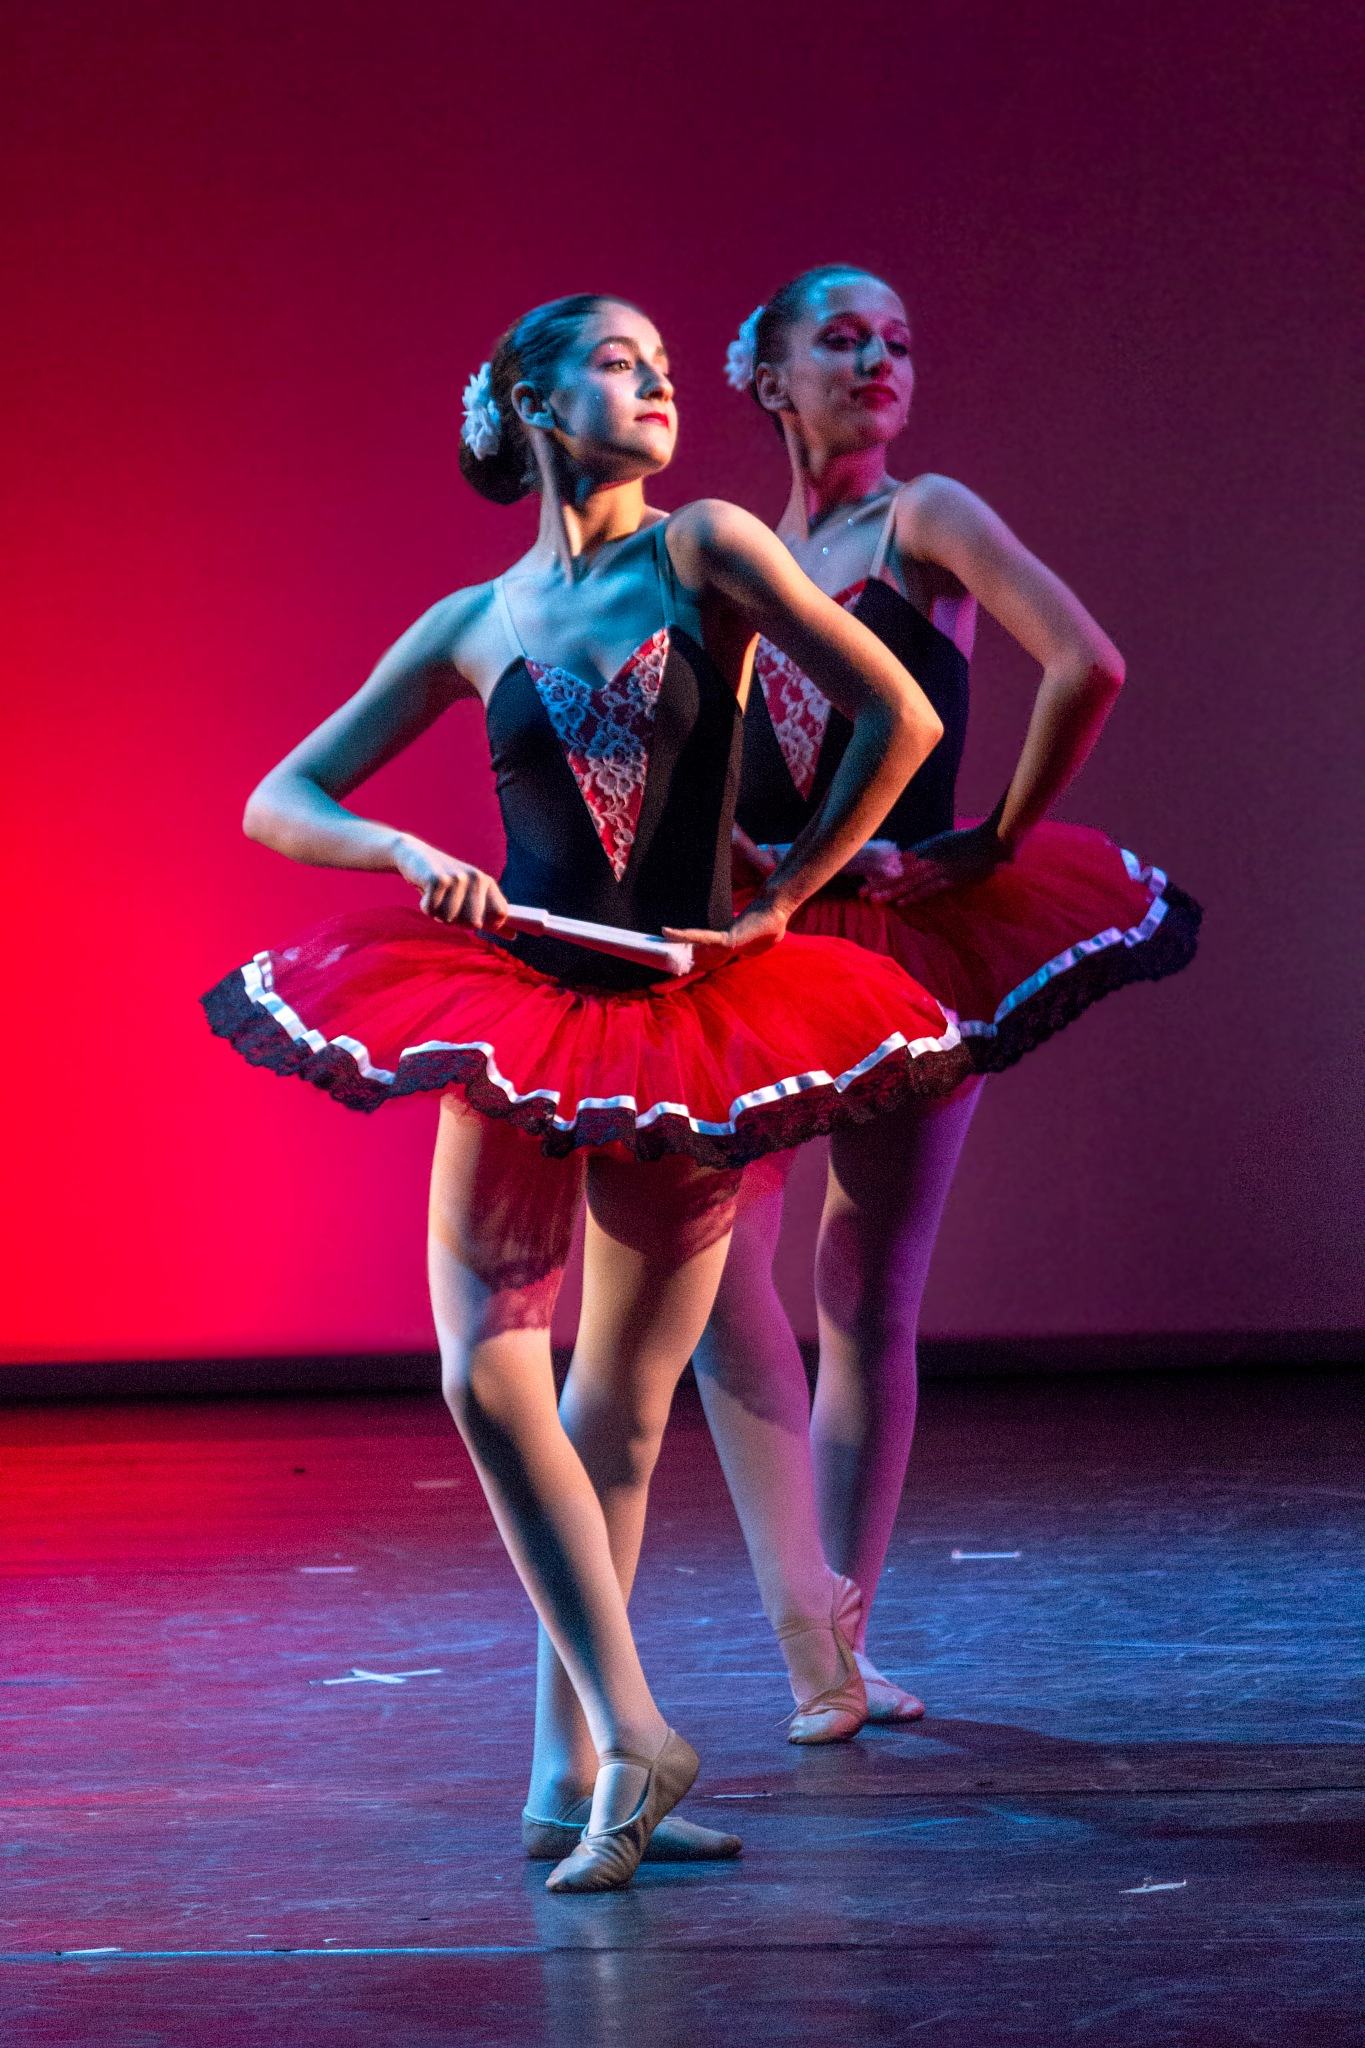 Dancing  by Eddy Chirizzi